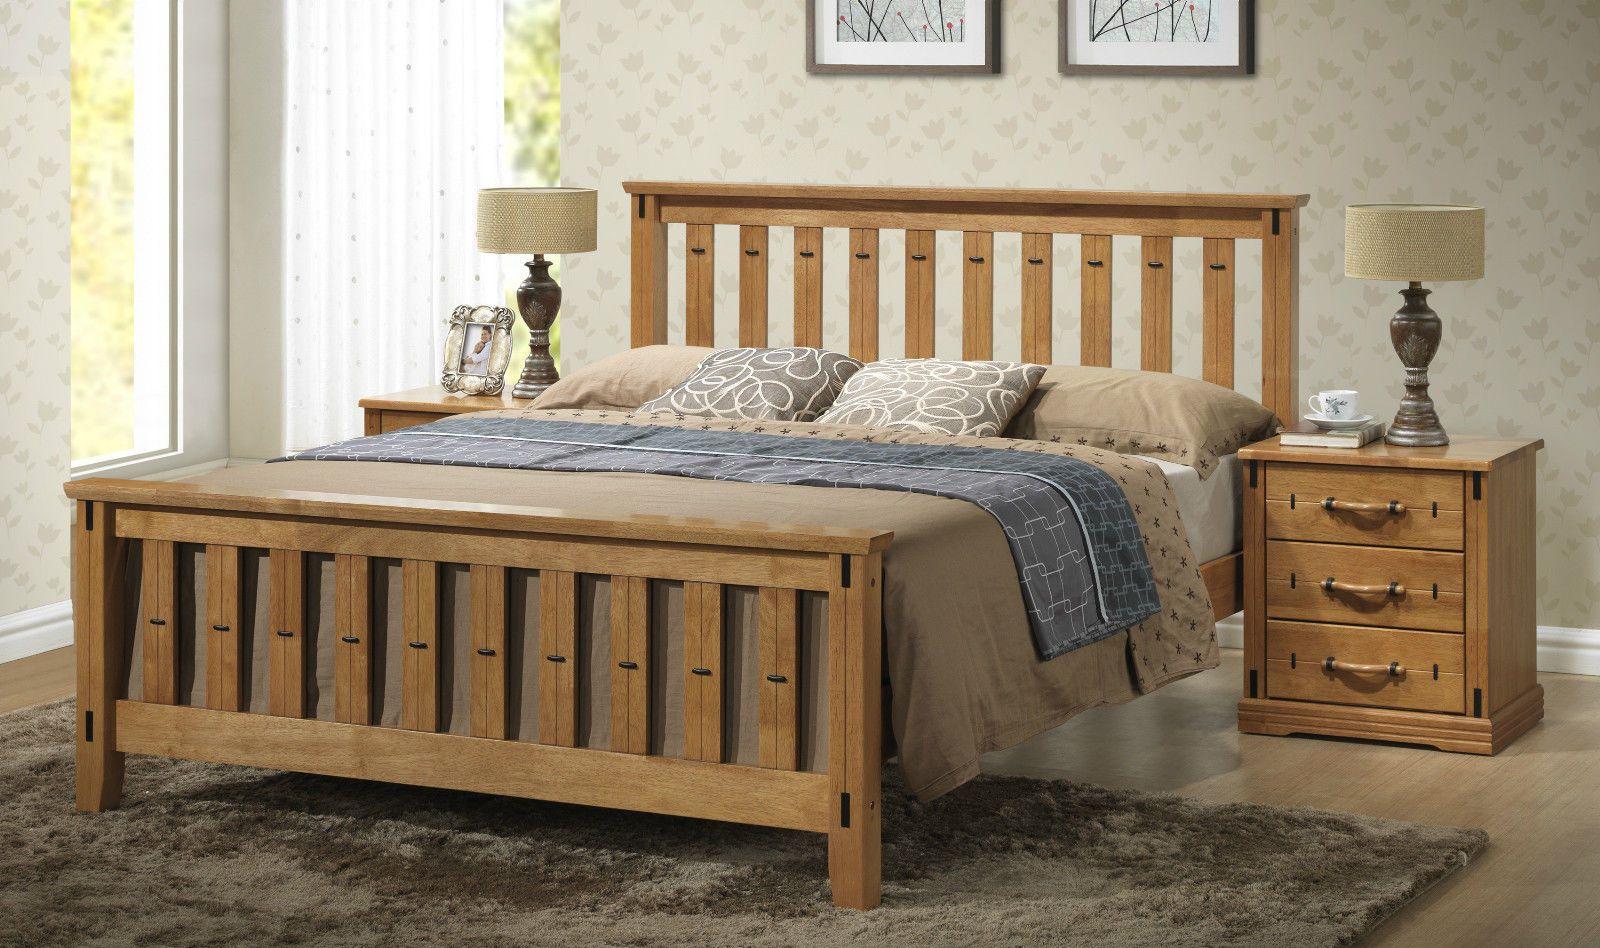 Sofia Shaker Style Wooden Bed Frame 4ft6 Double 5ft Kingsize